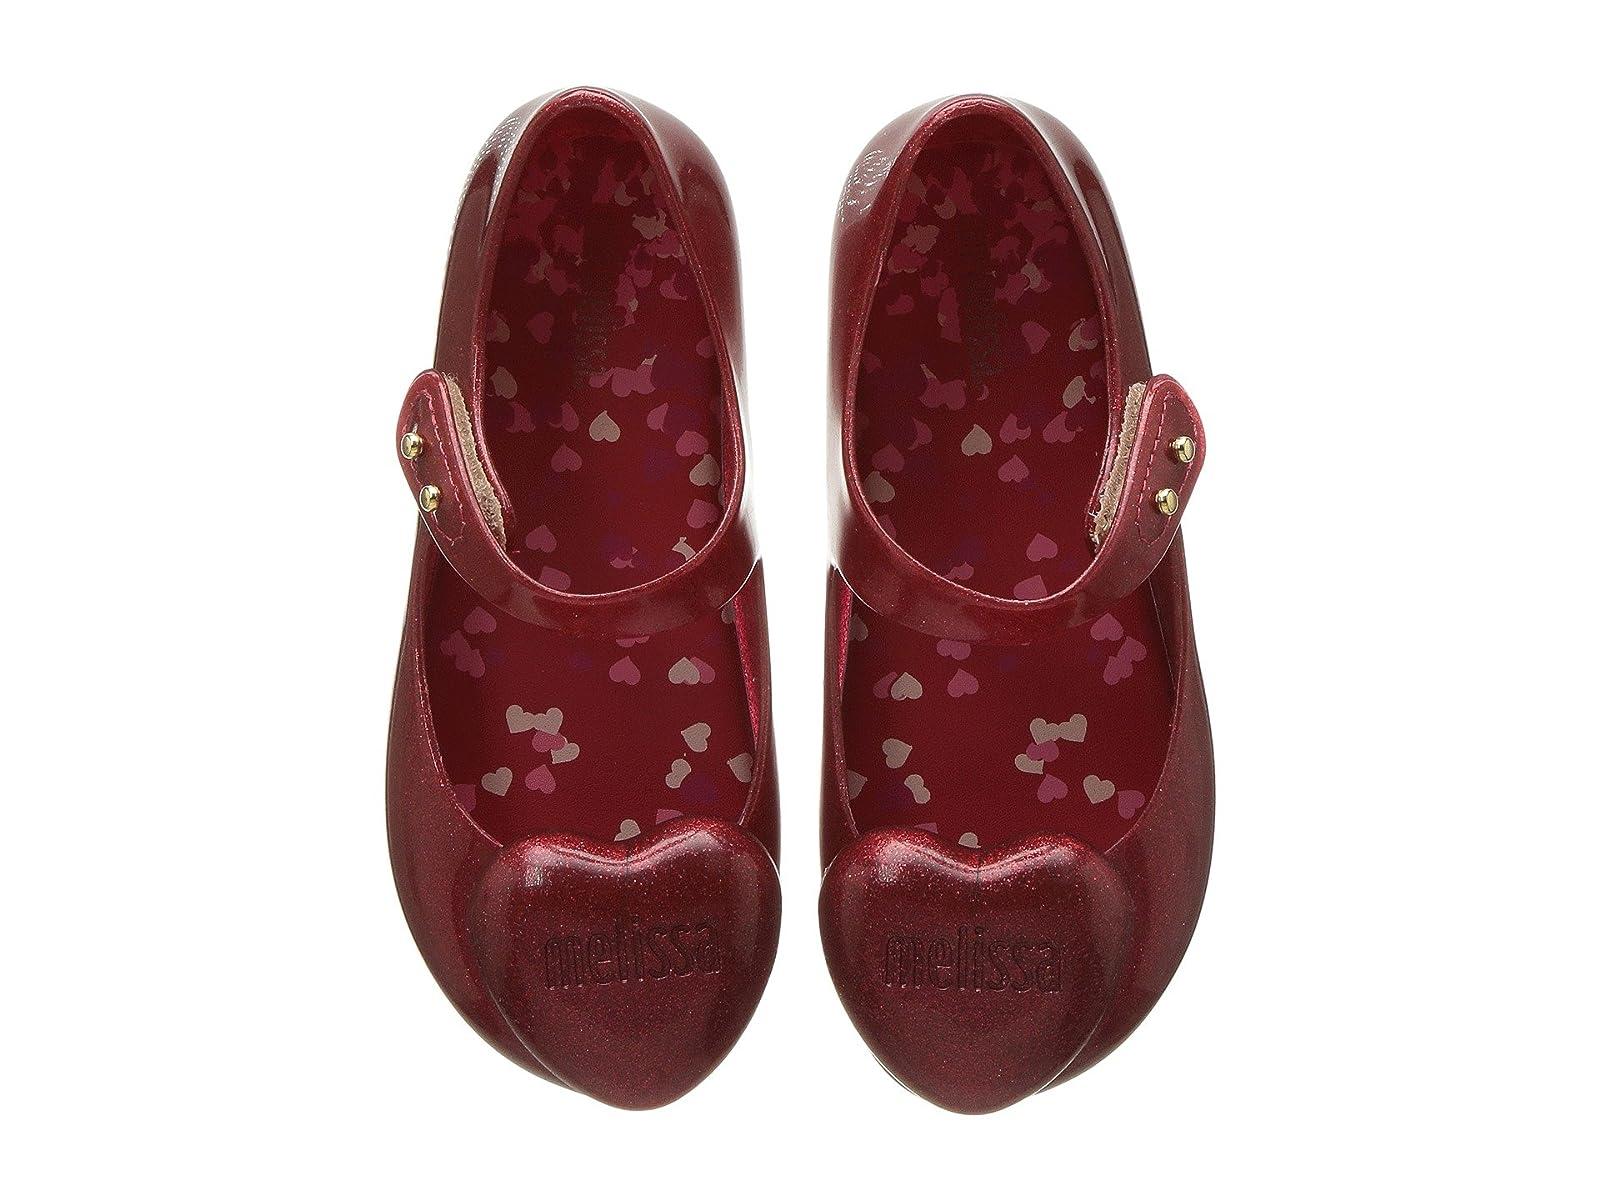 Mini Melissa Mini Ultragirl Heart (Toddler/Little Kid)Cheap and distinctive eye-catching shoes